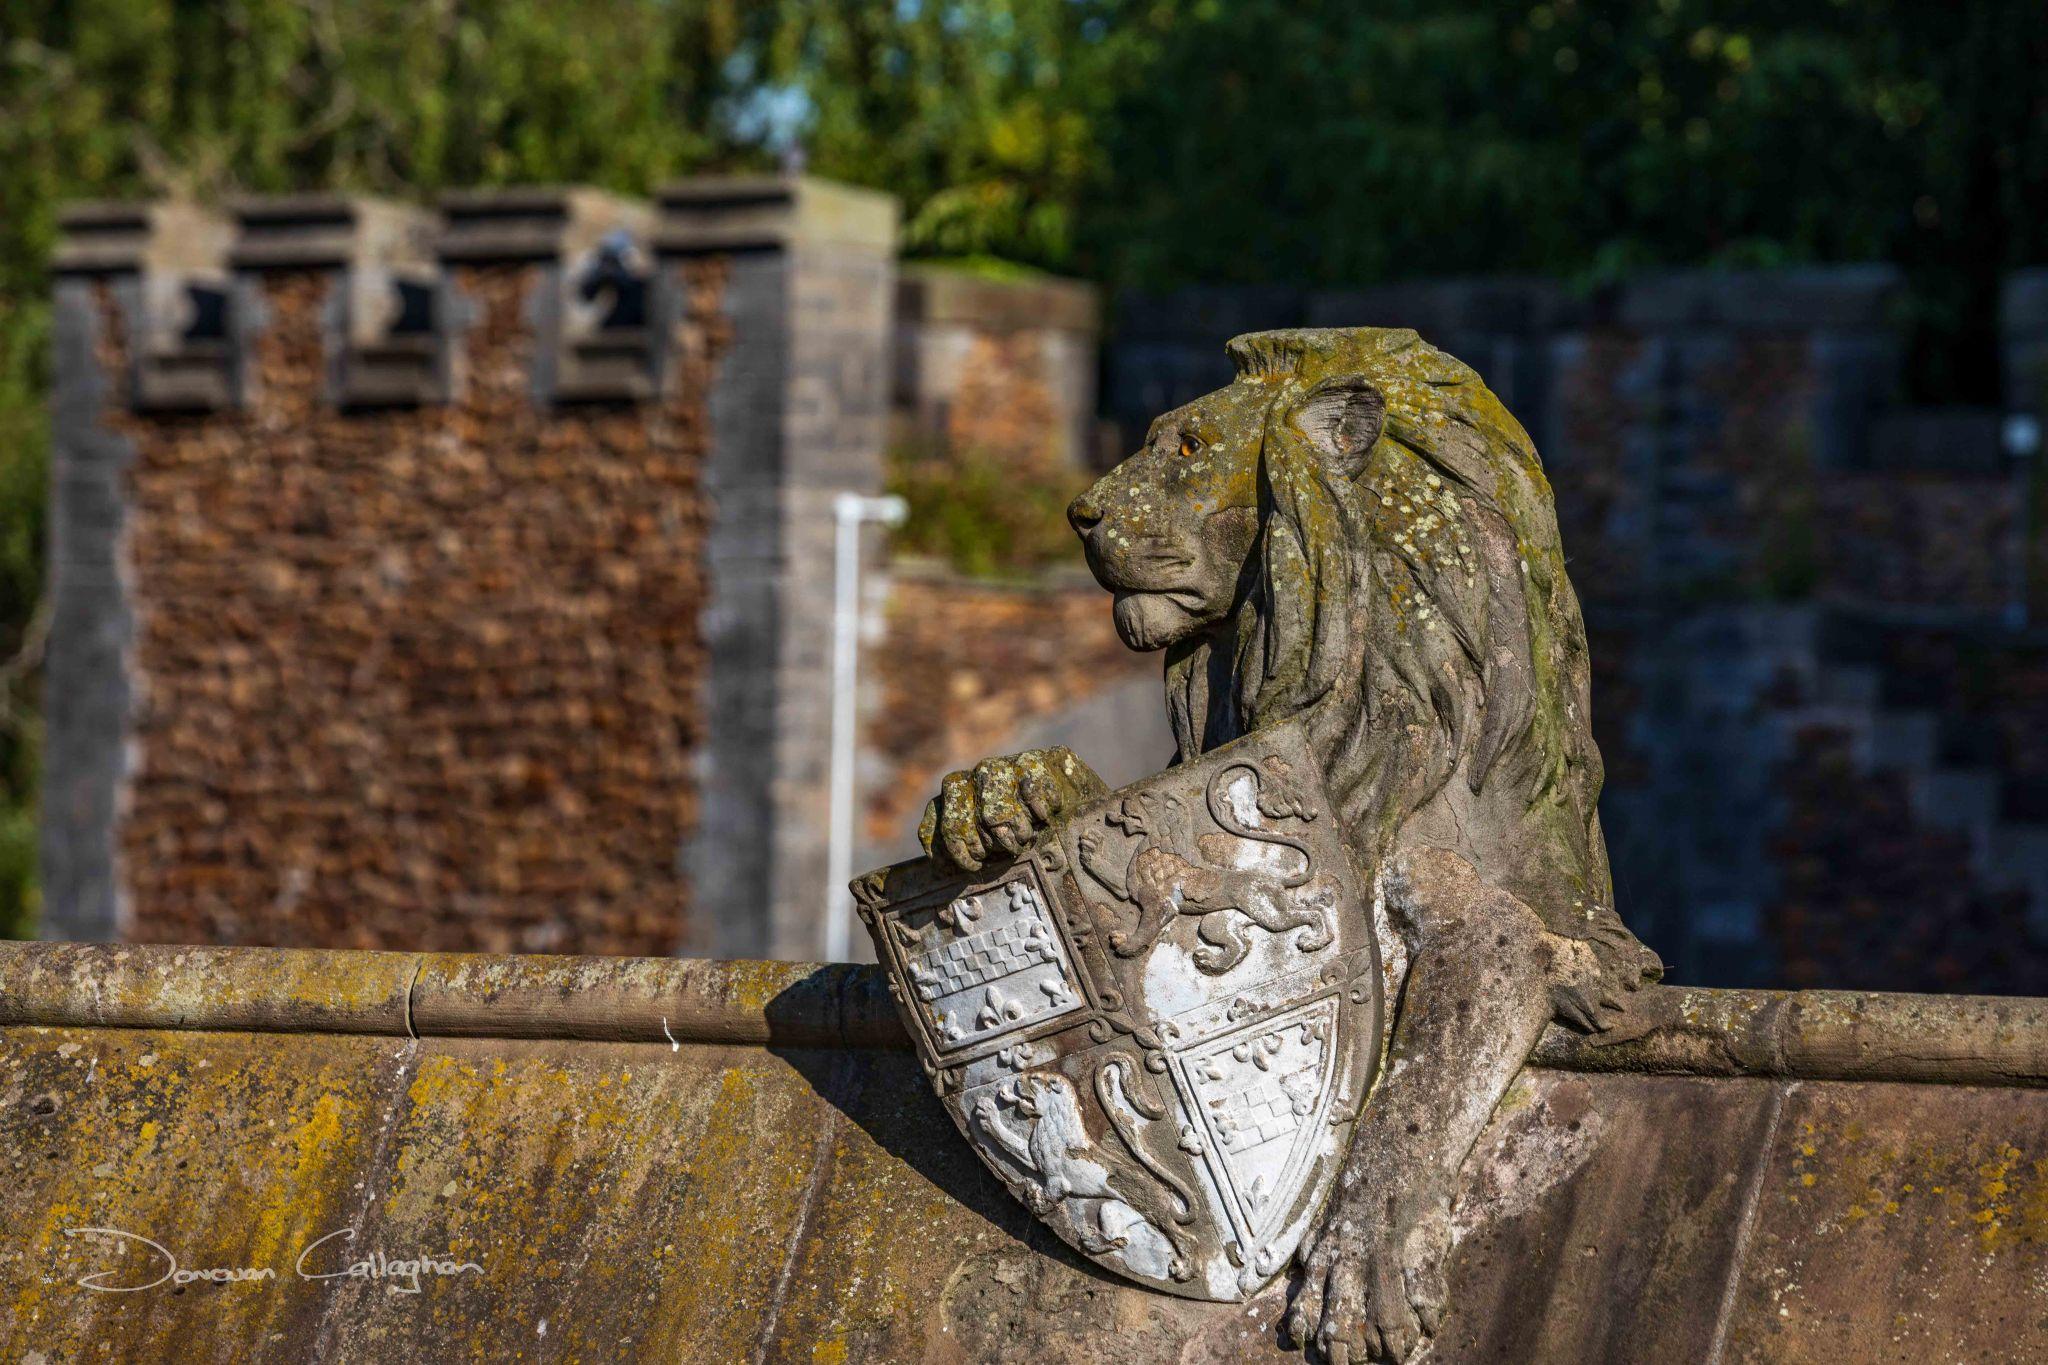 Cardiff Castle Lion on roof, Wales, United Kingdom